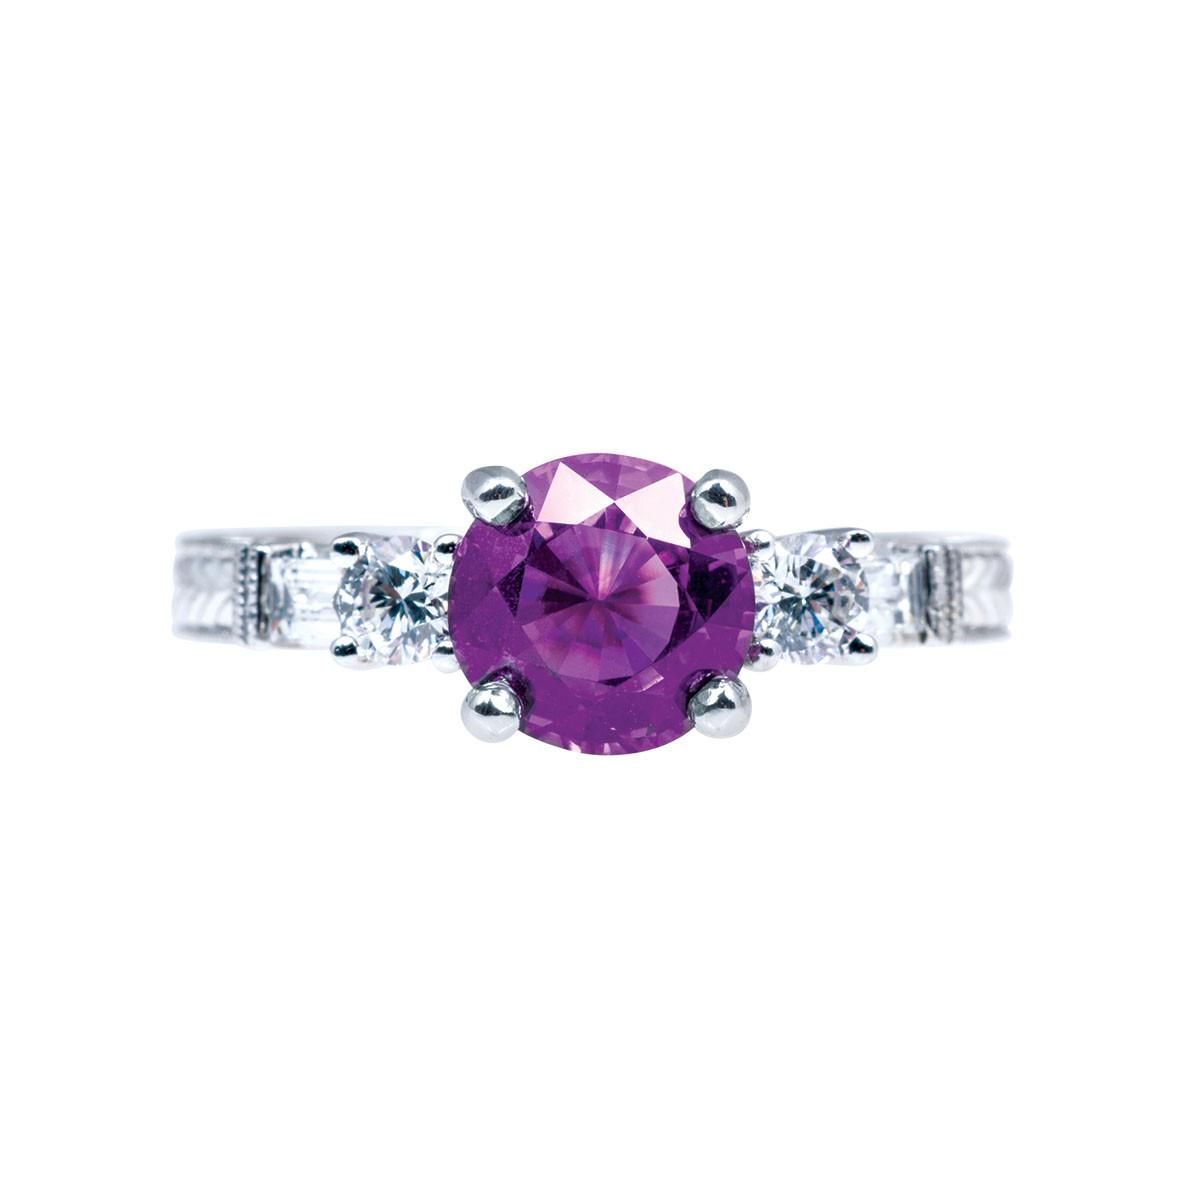 Vintage 1.87 CTW Pinkish Purple Sapphire & Diamond Ring